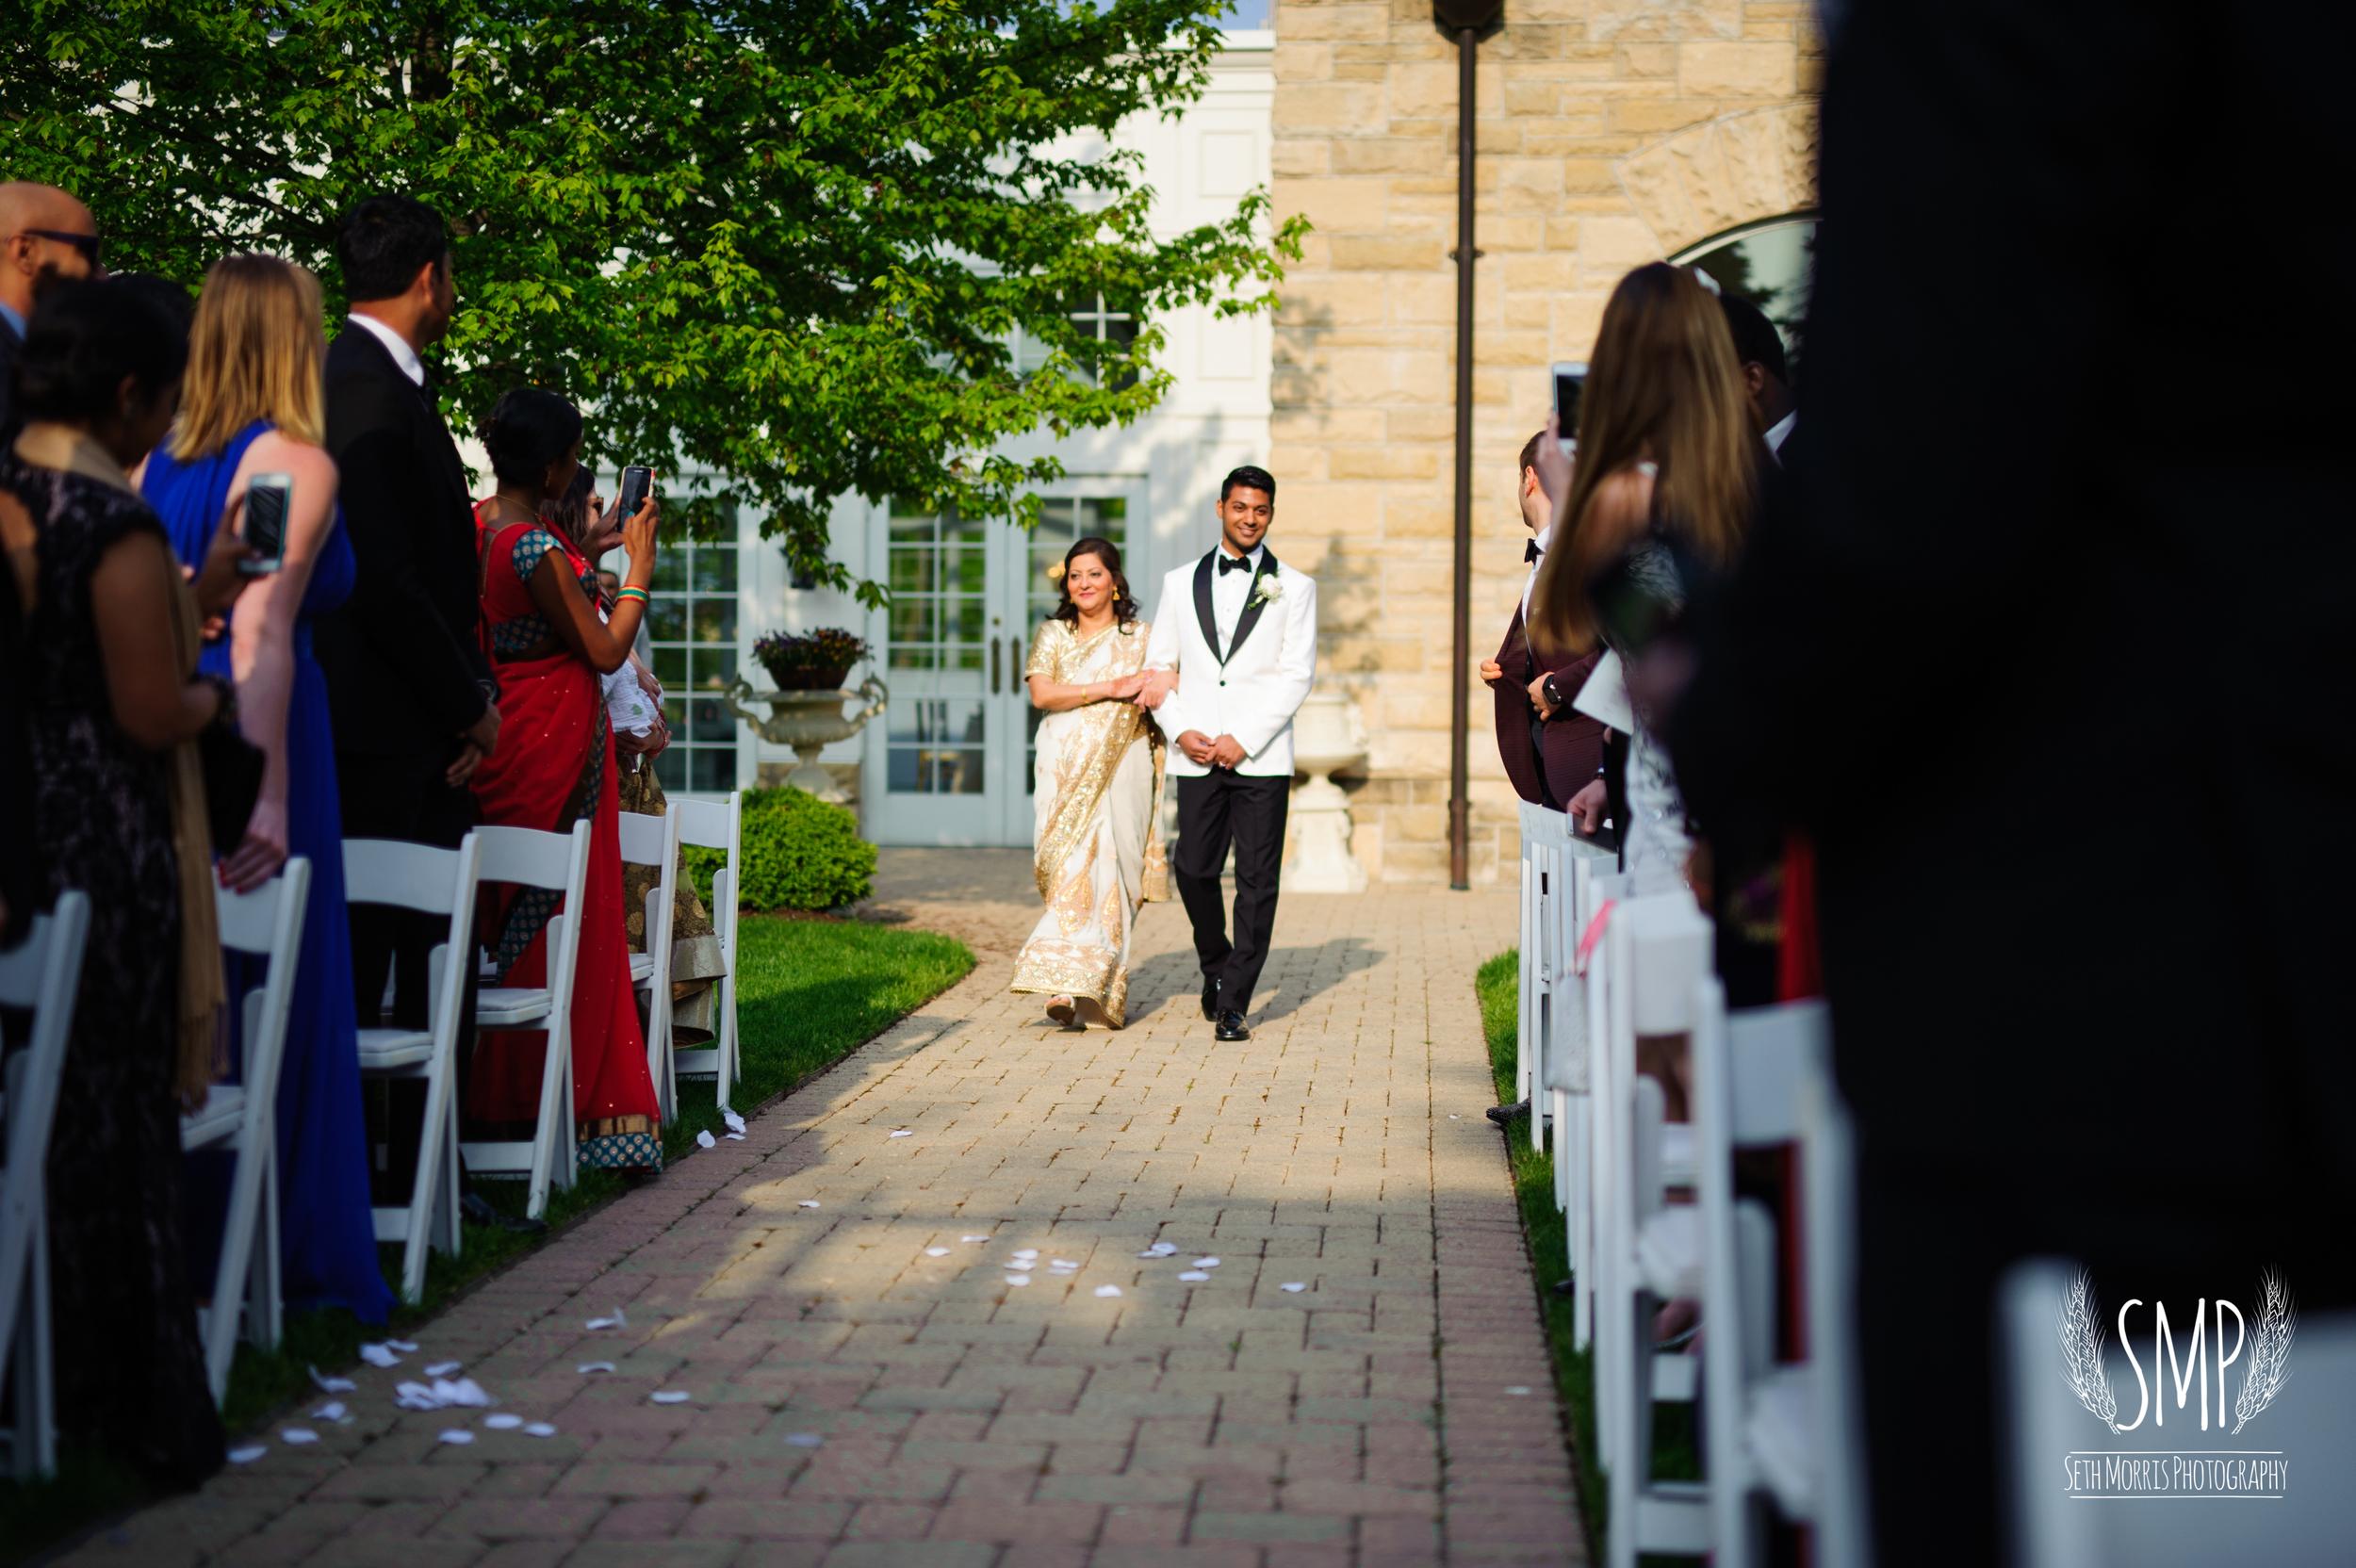 same-sex-wedding-photographer-chicago-illinois-71.jpg